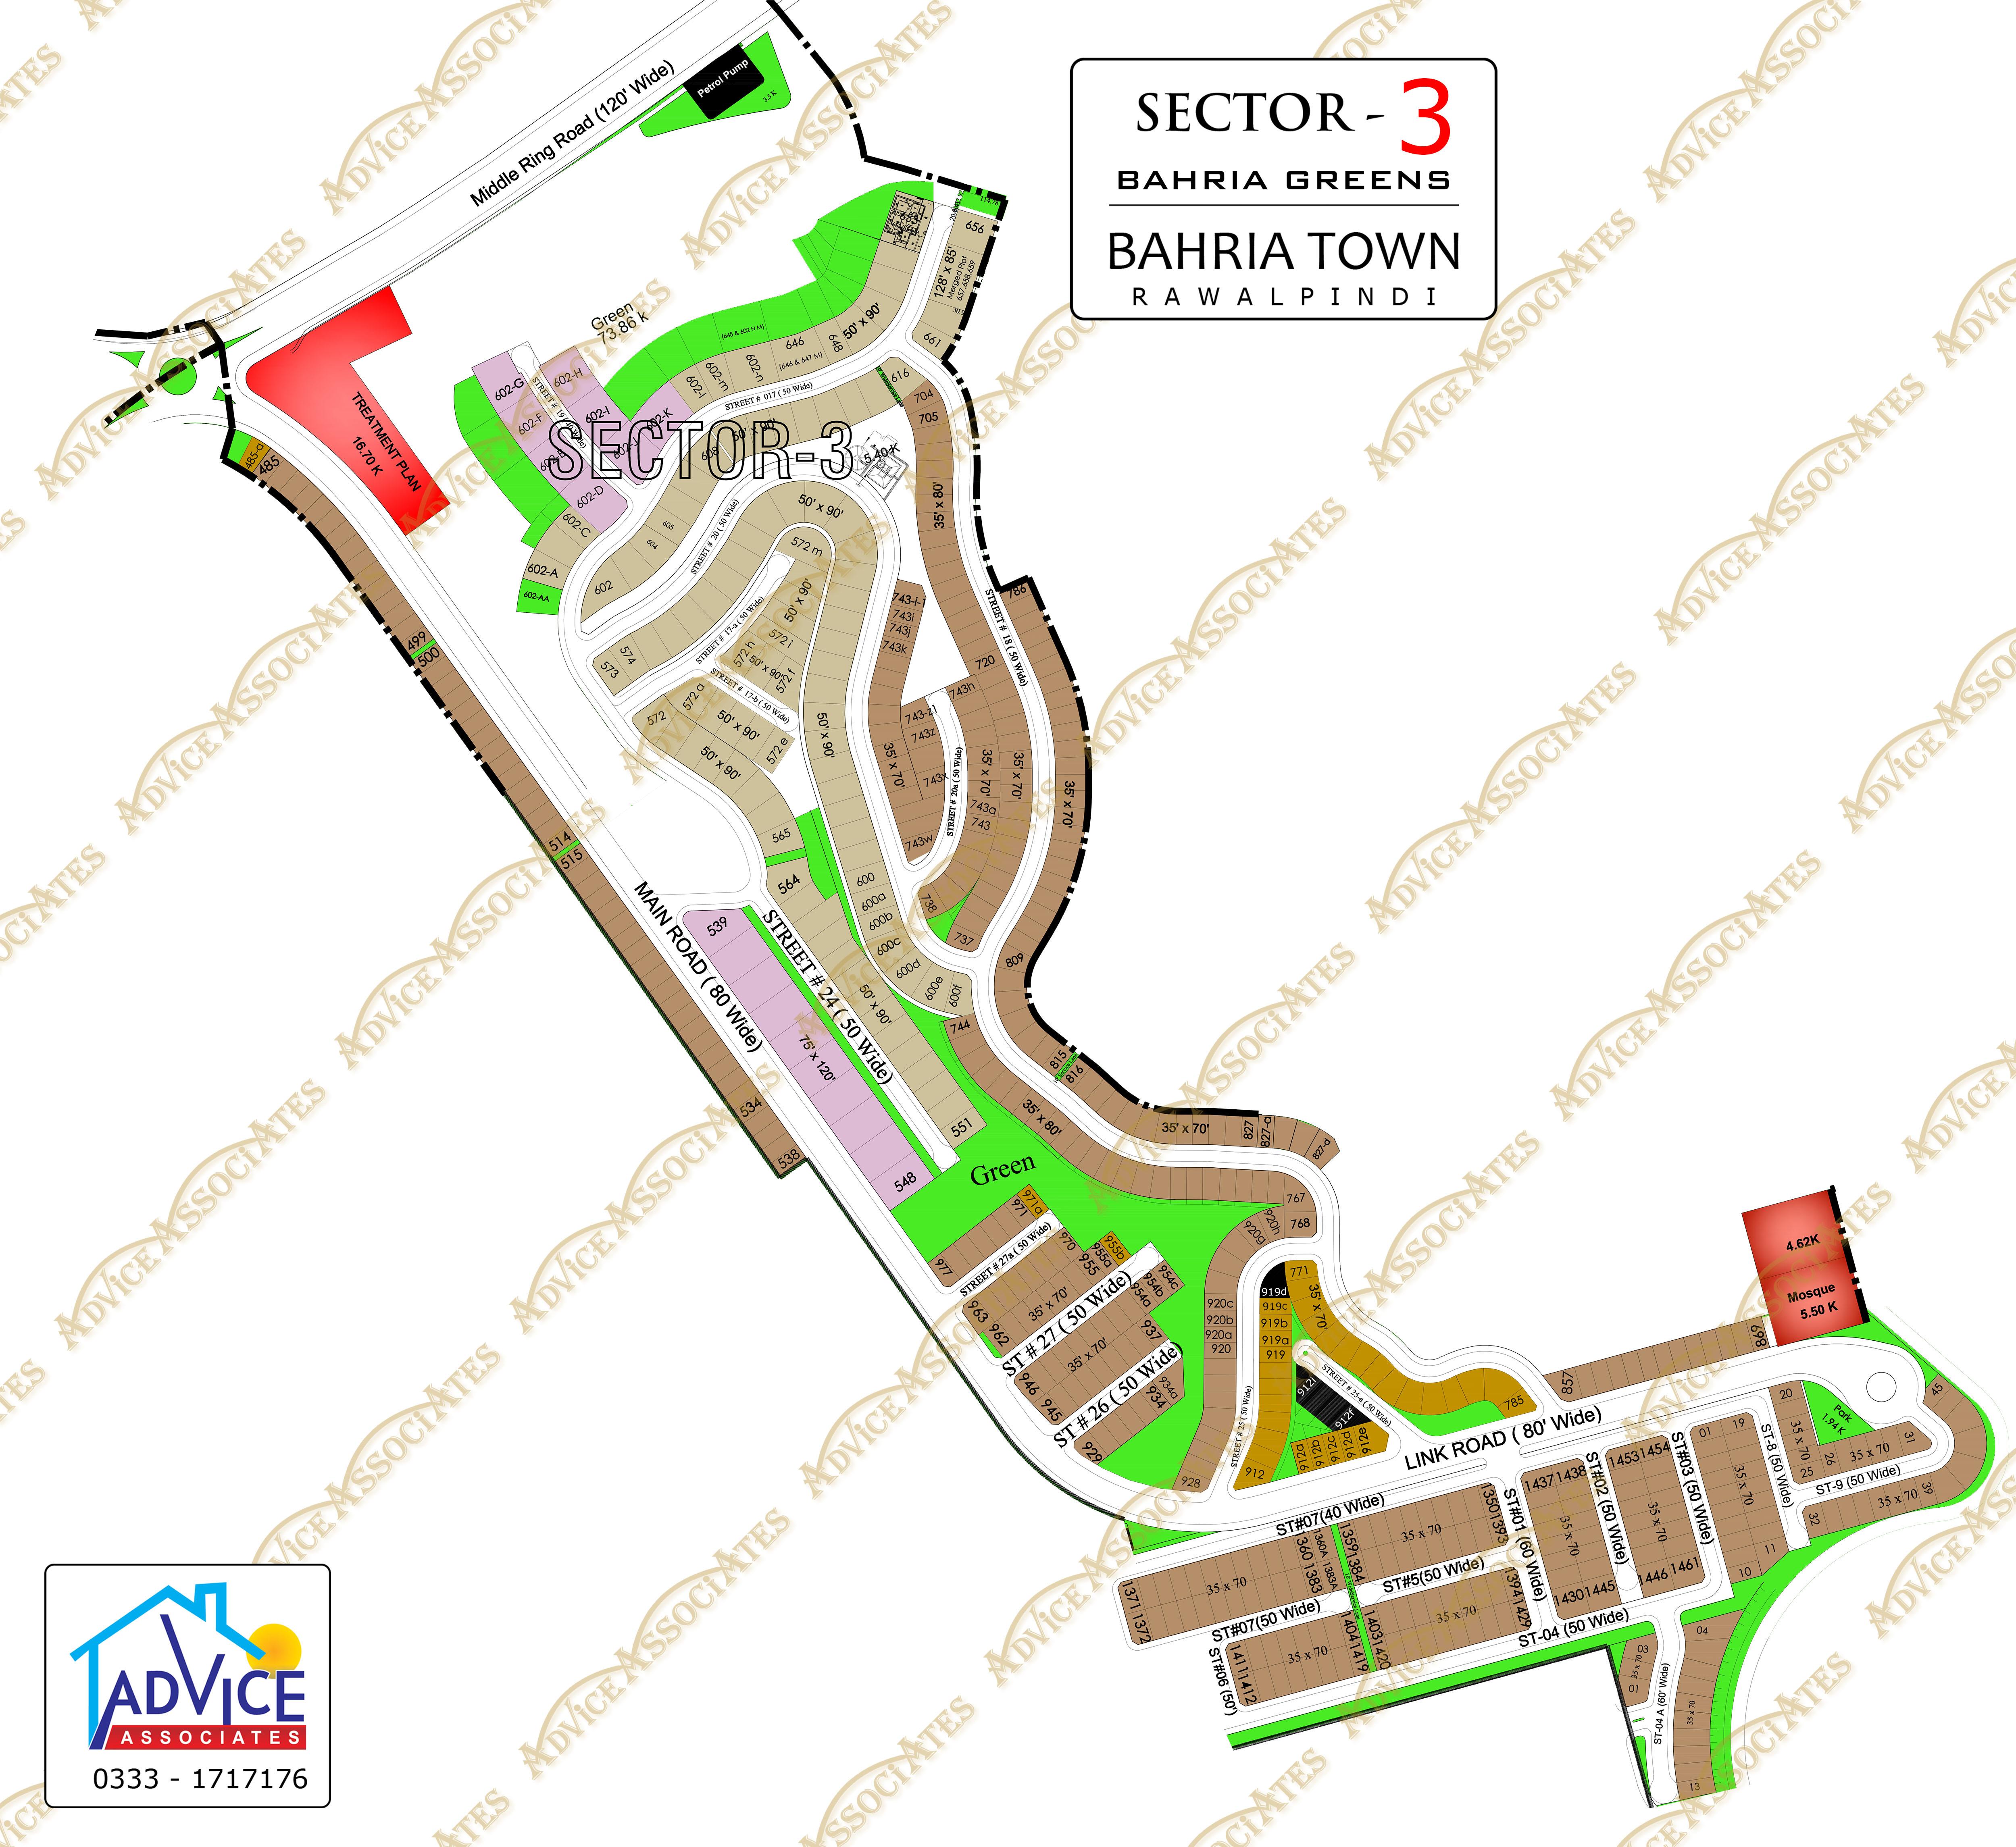 Bahria Greens Sector 3